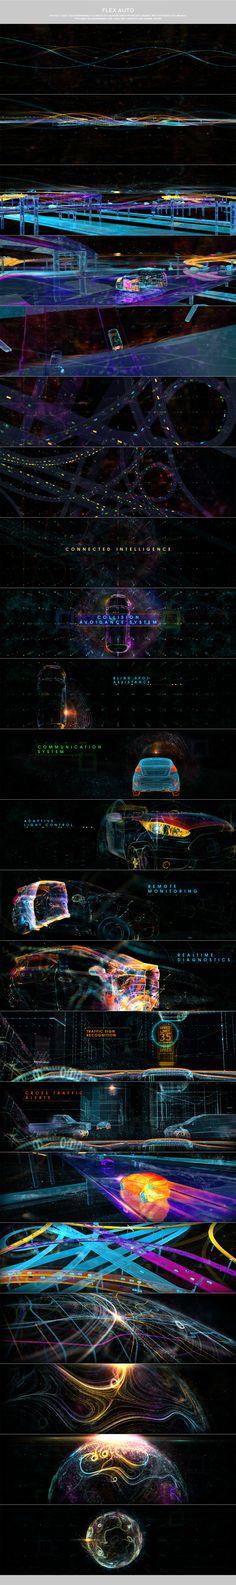 FLEX AUTO on Behance